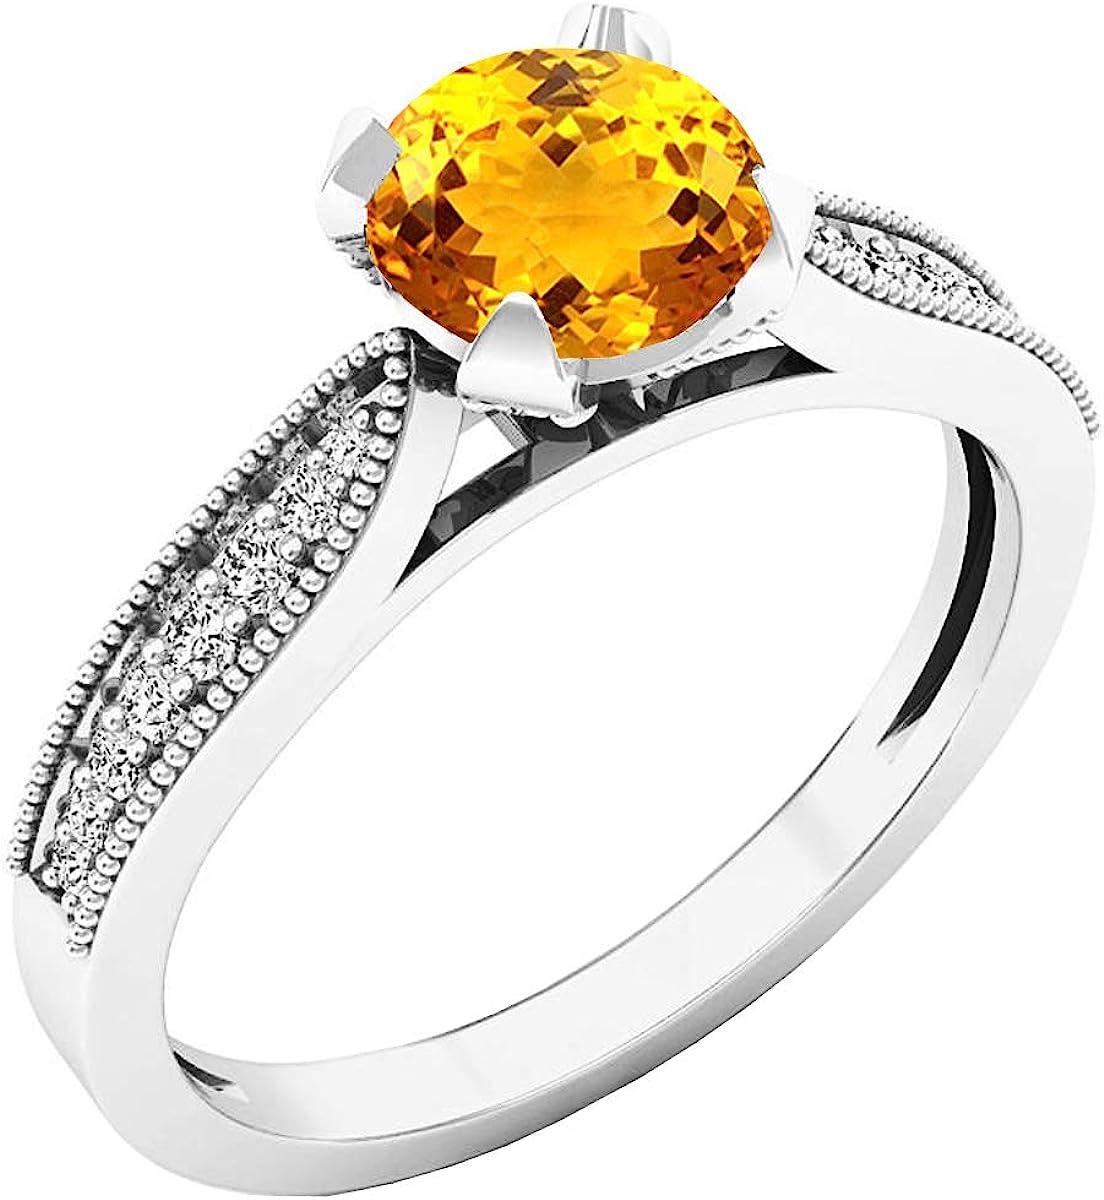 Dazzlingrock Collection 6 MM New Orleans Mall Round Bri Inexpensive Ladies Diamond Gemstone